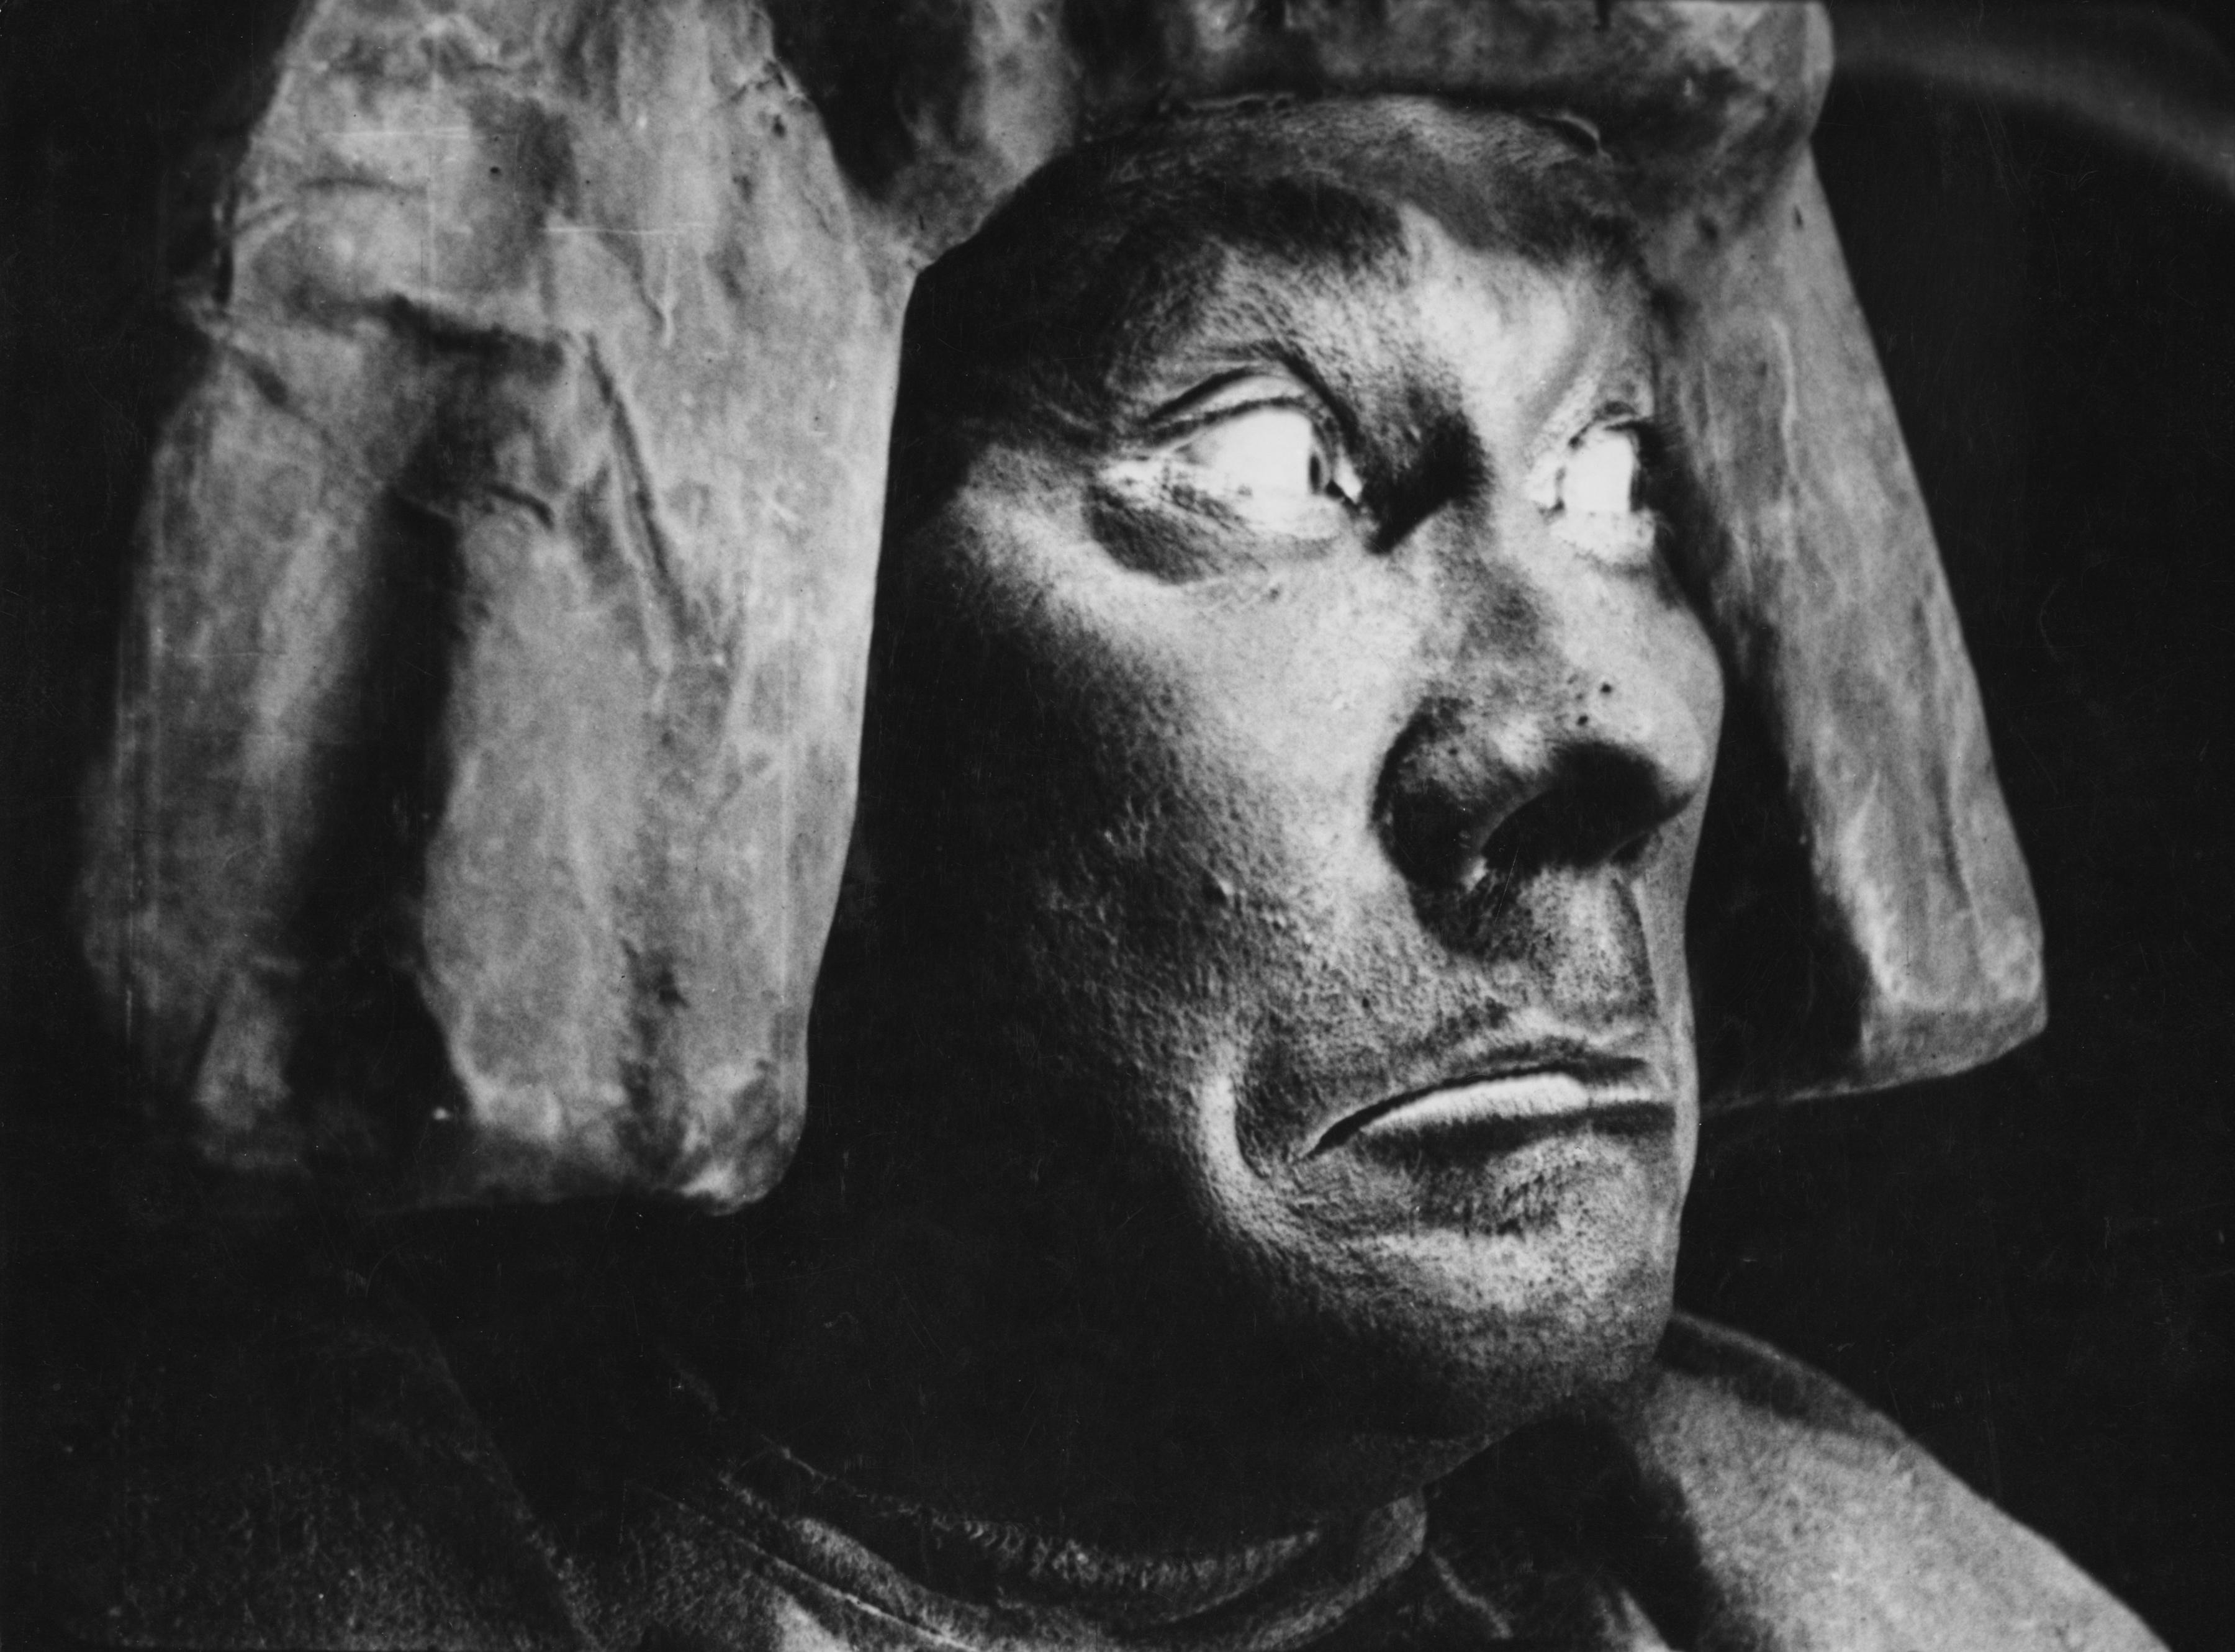 Znalezione obrazy dla zapytania golem movie 1920